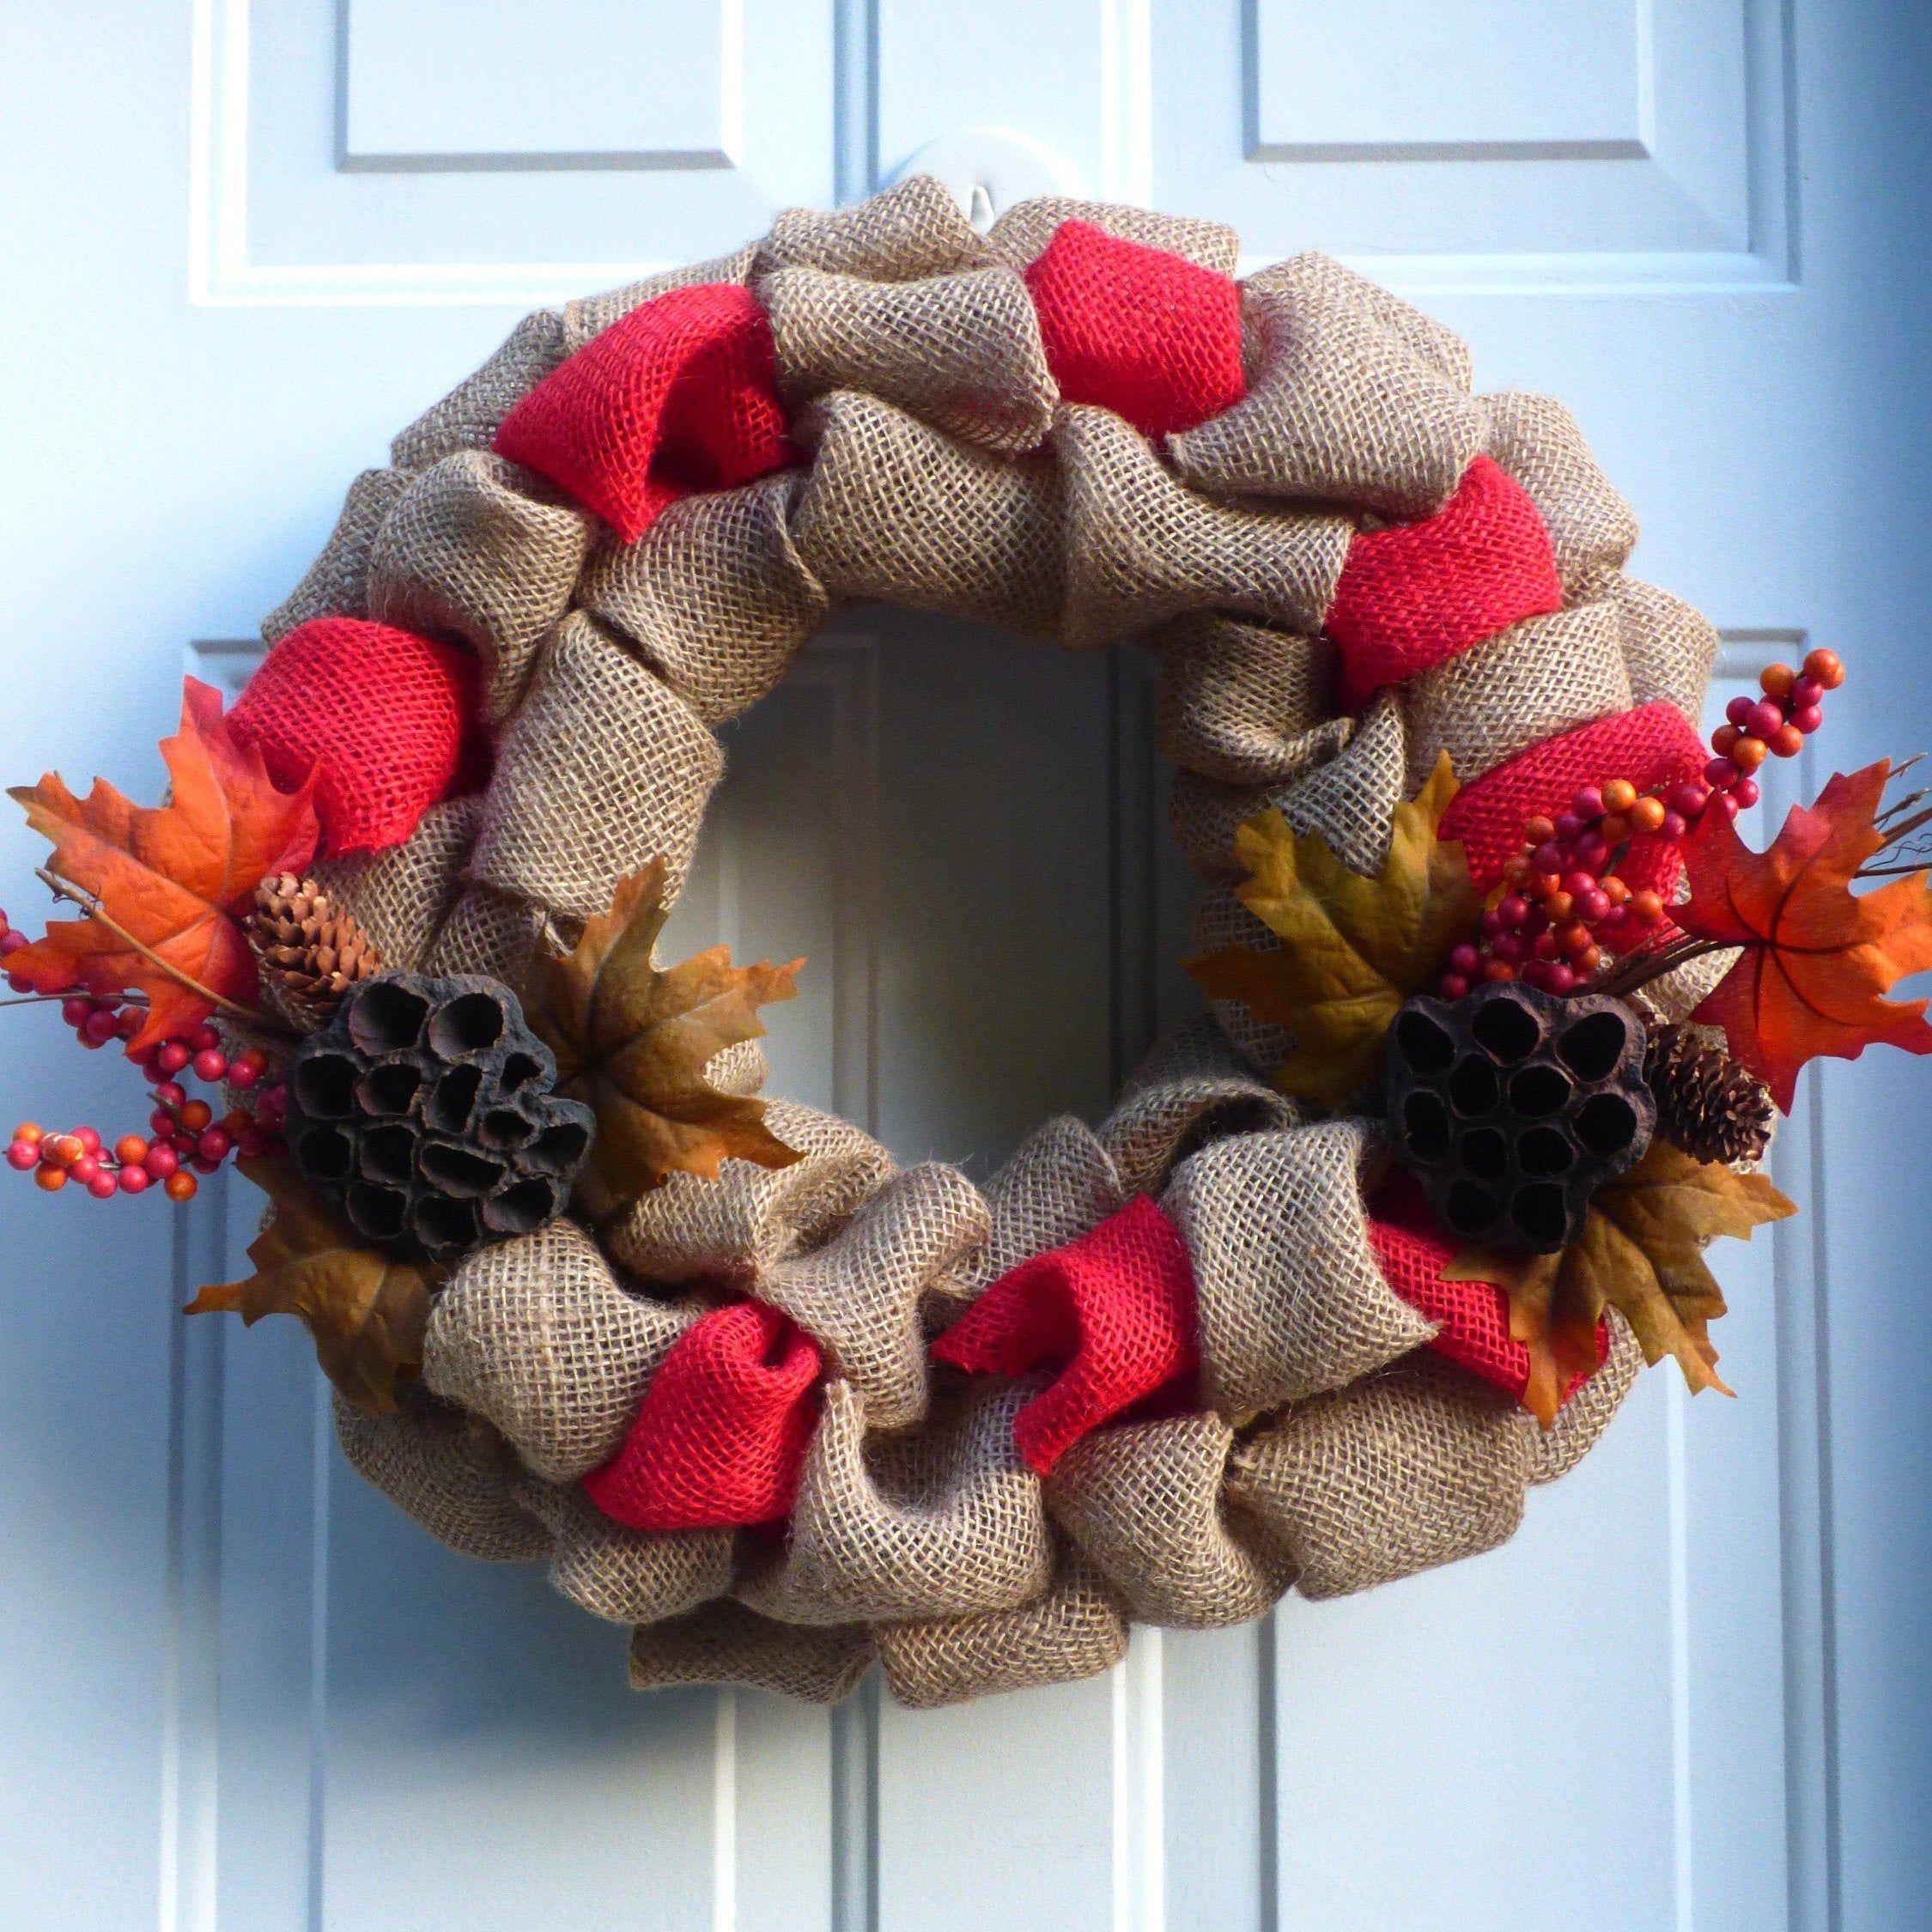 fall wreath Fall Burlap Wreath fall decor autumn burlap wreath wreath front door wreath autumn decor natural wreath autumn wreath